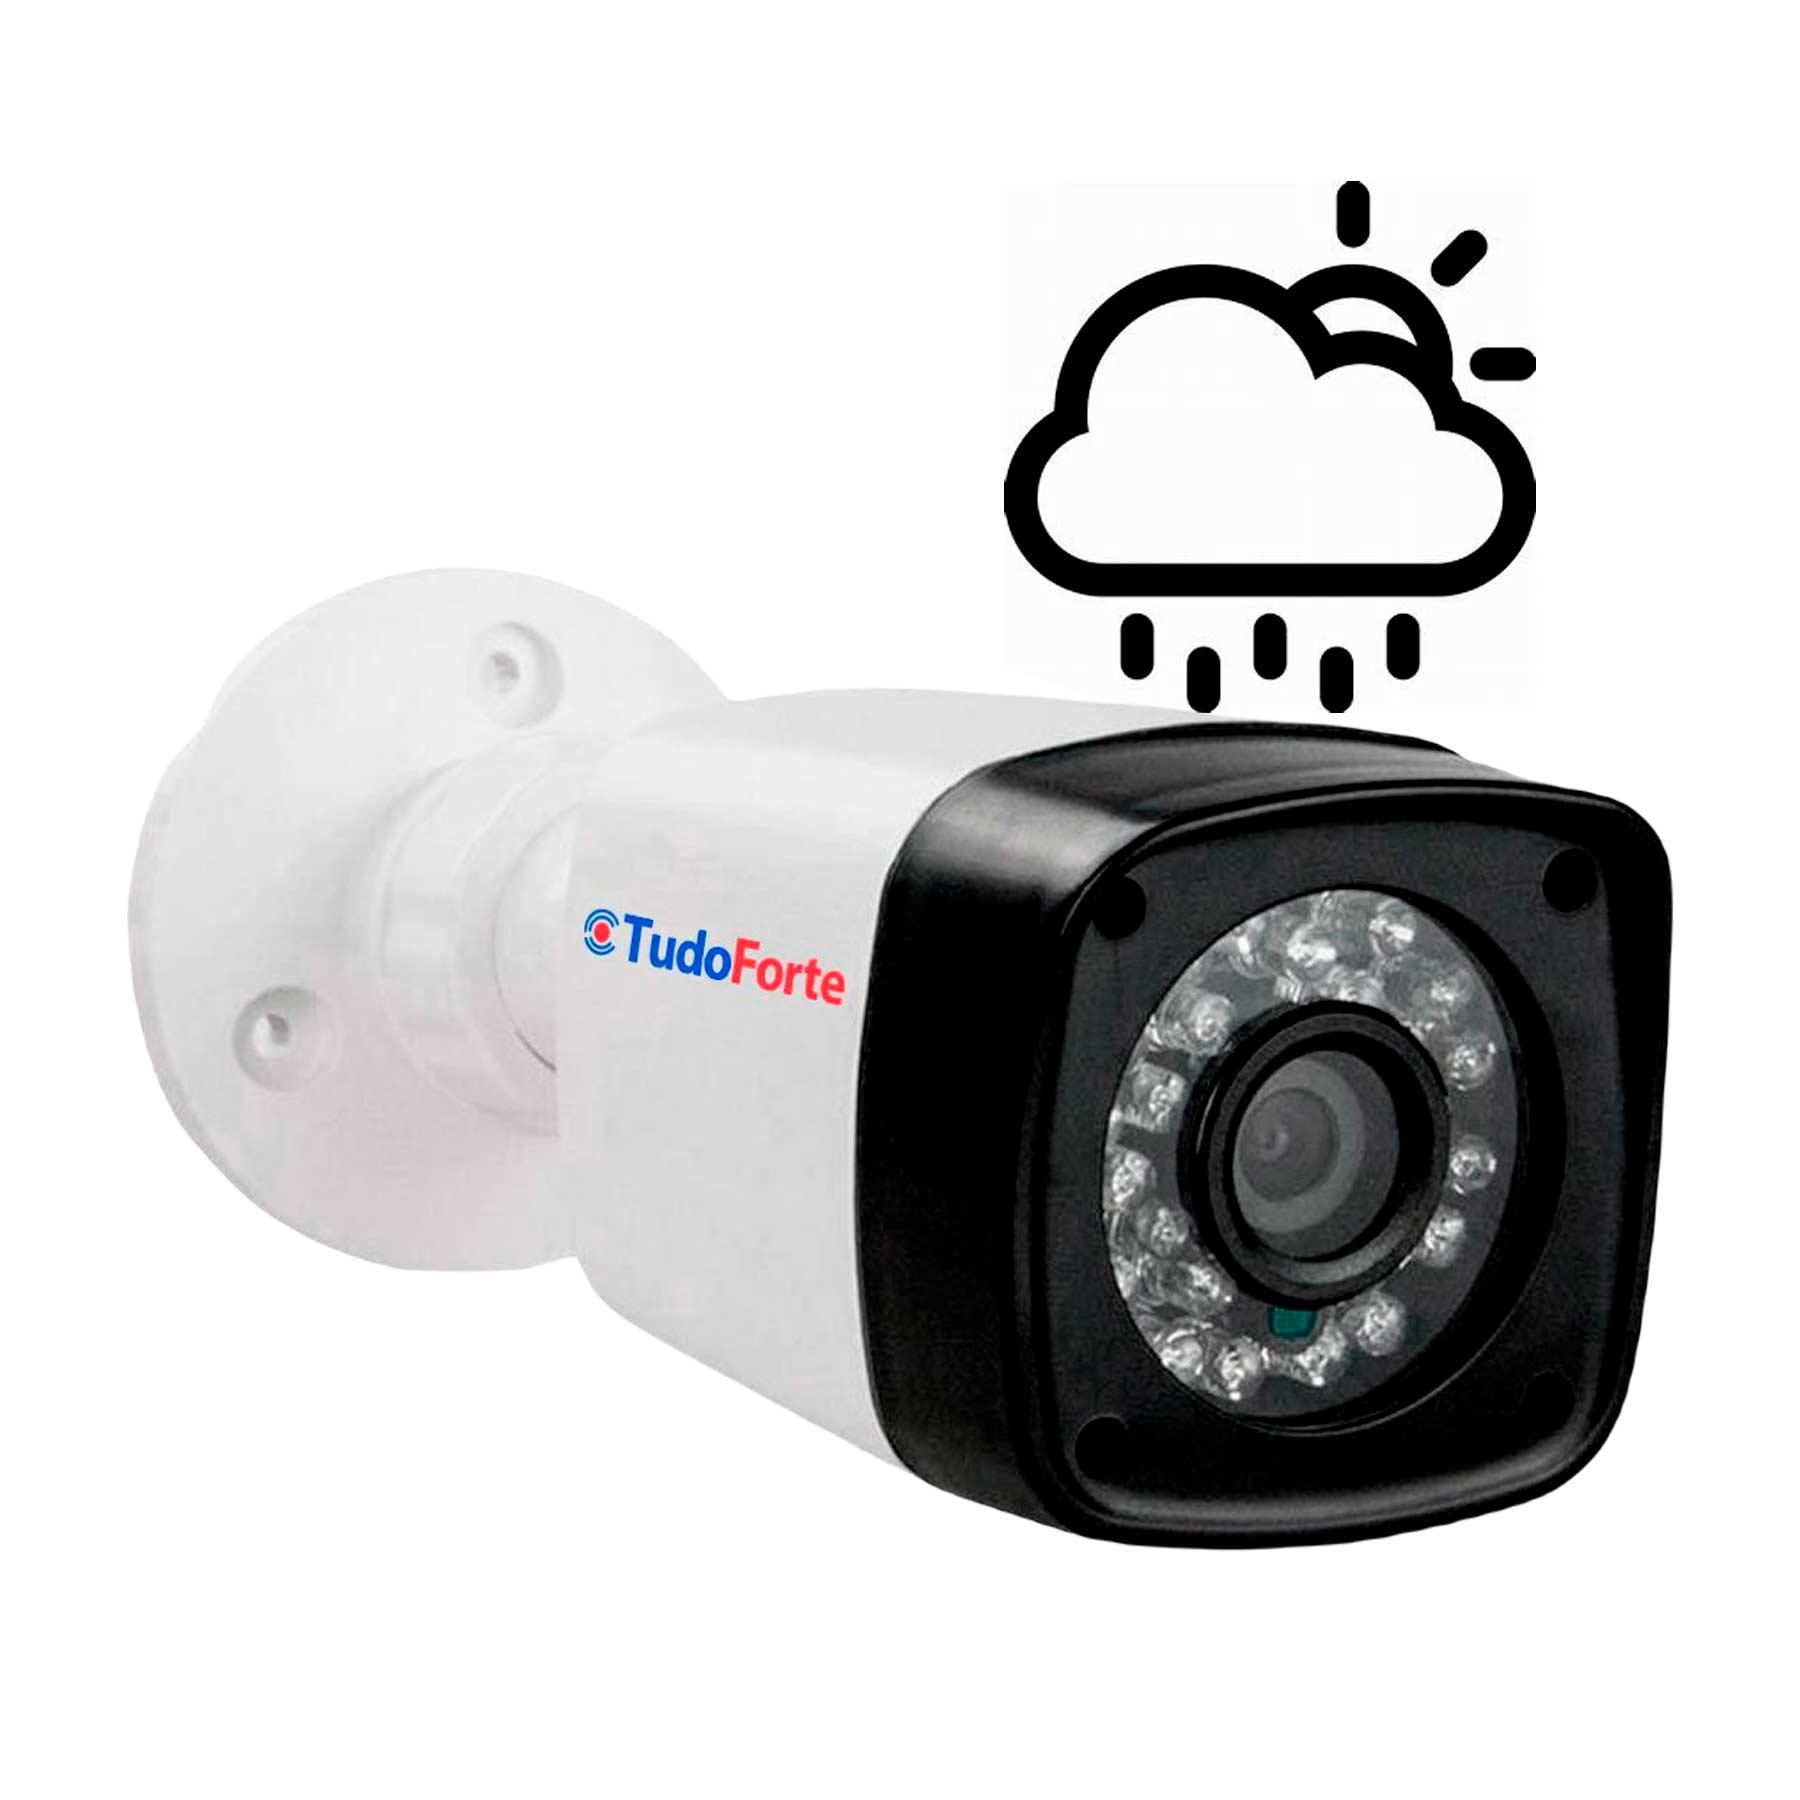 camera-de-seguranca-full-hd-1080p-2mp-bullet-20-metros-infravermelho-tudo-forte-03